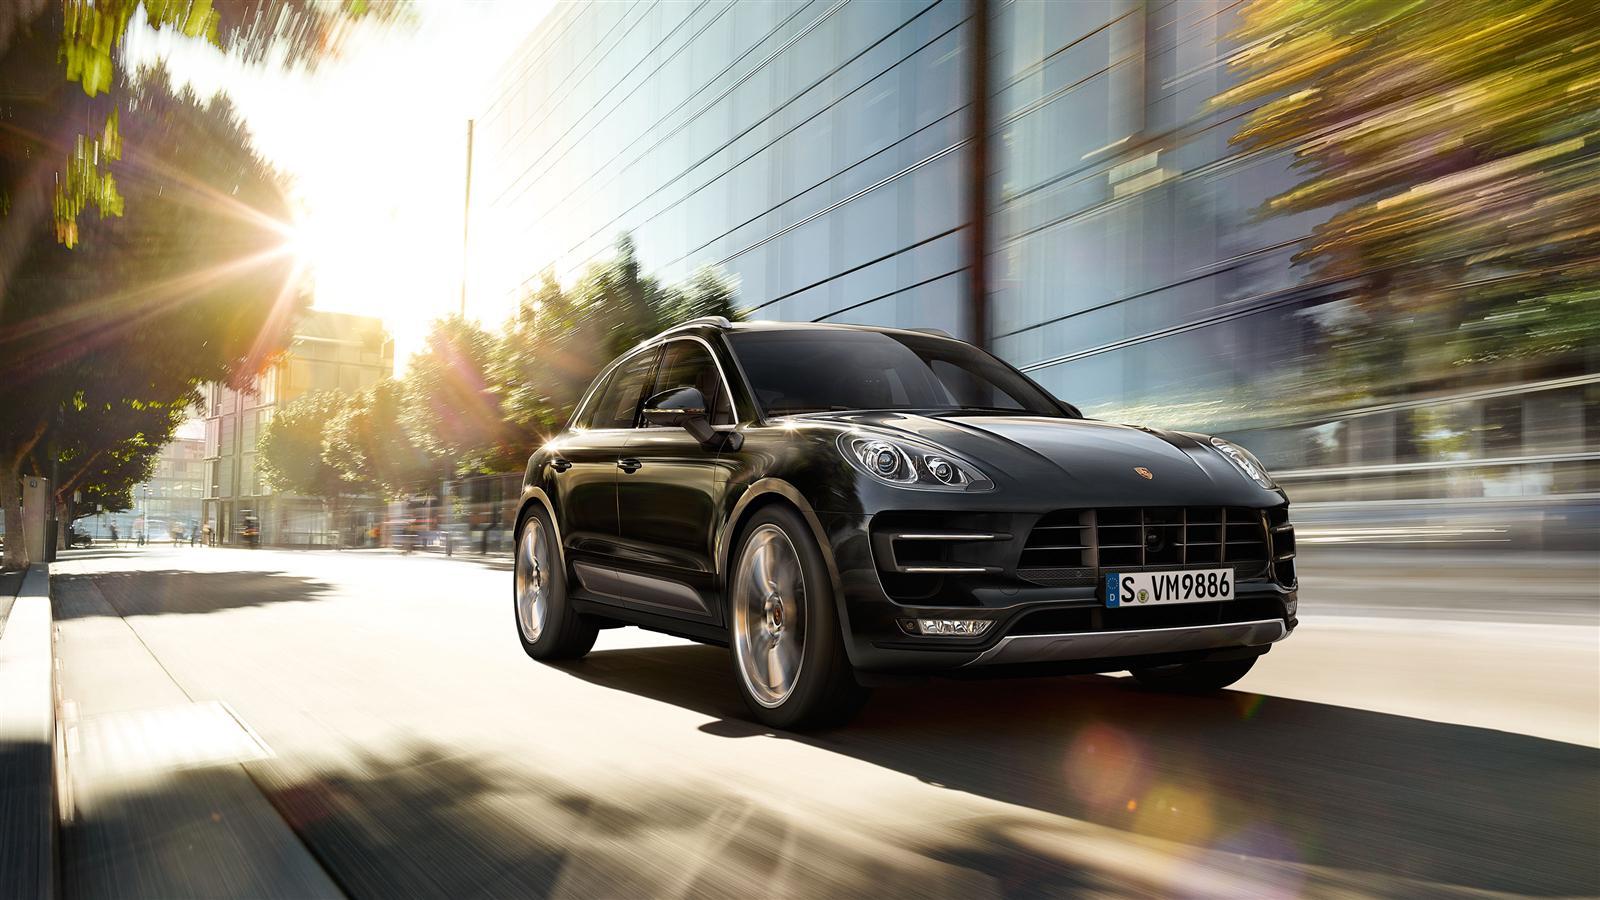 2017 Porsche Cayenne Gts >> 2020 Porsche Macan Could Receive Coupe-Styled Version - autoevolution